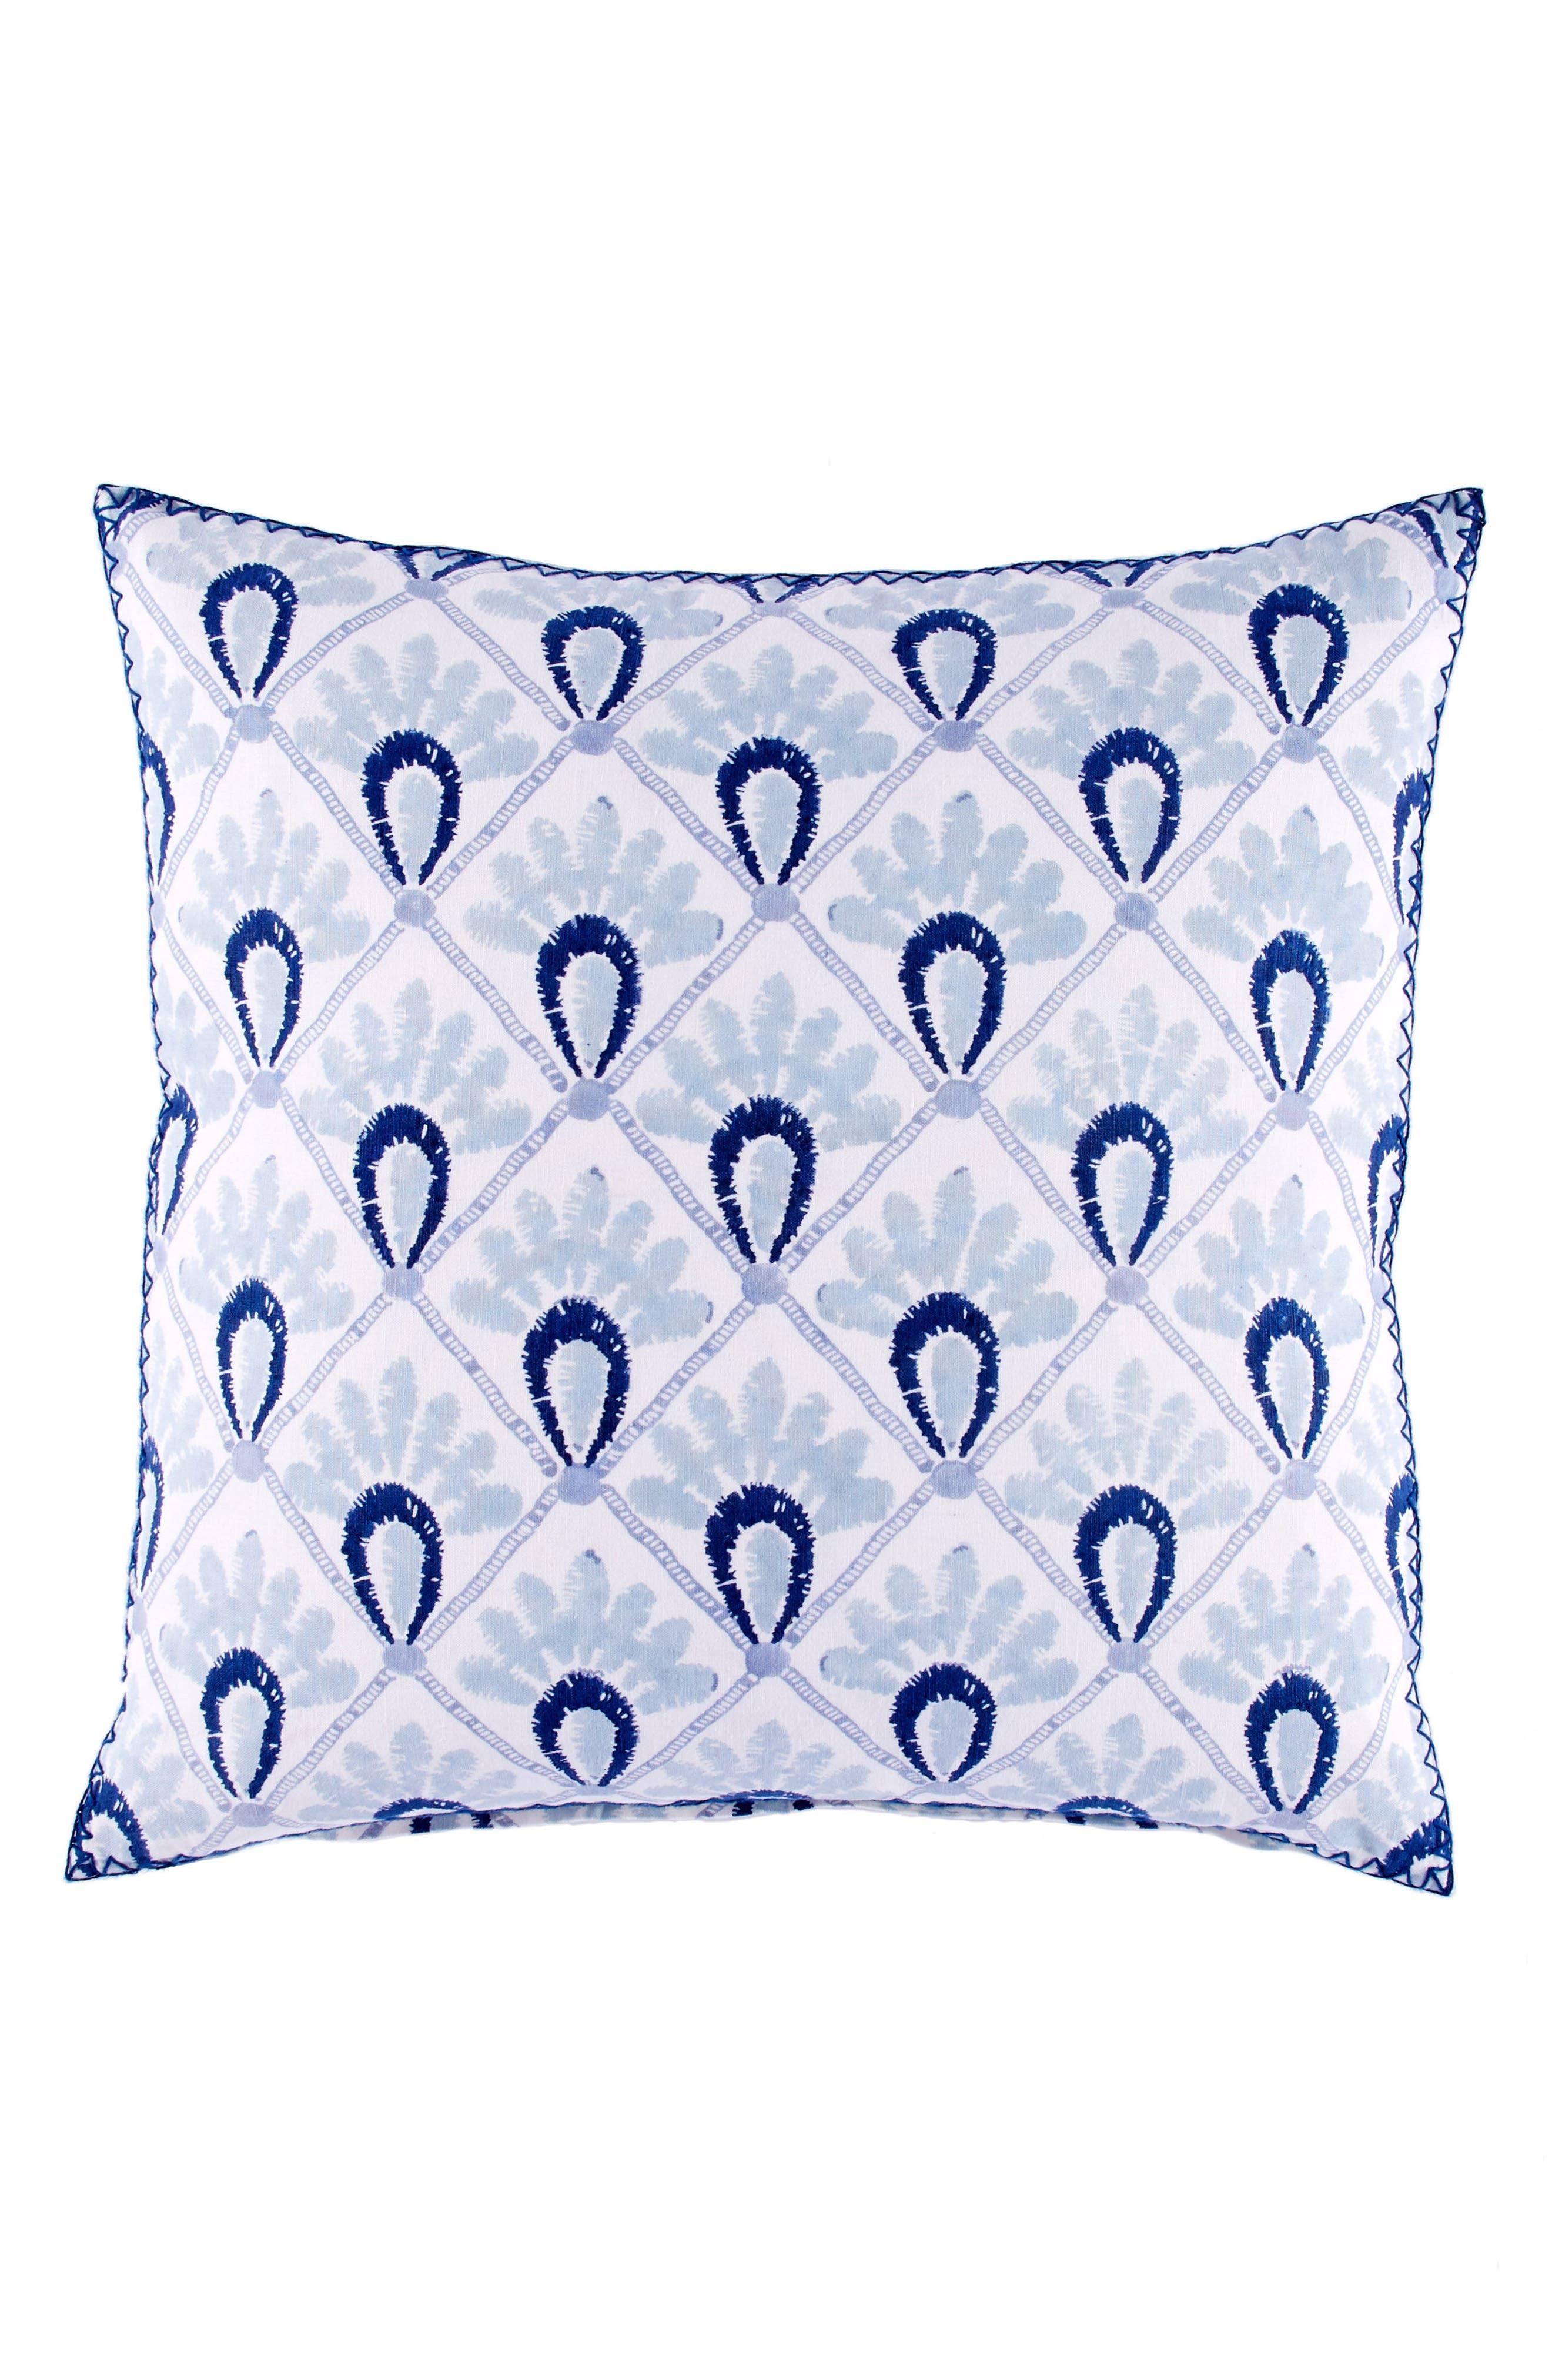 Main Image - John Robshaw Hila Accent Pillow